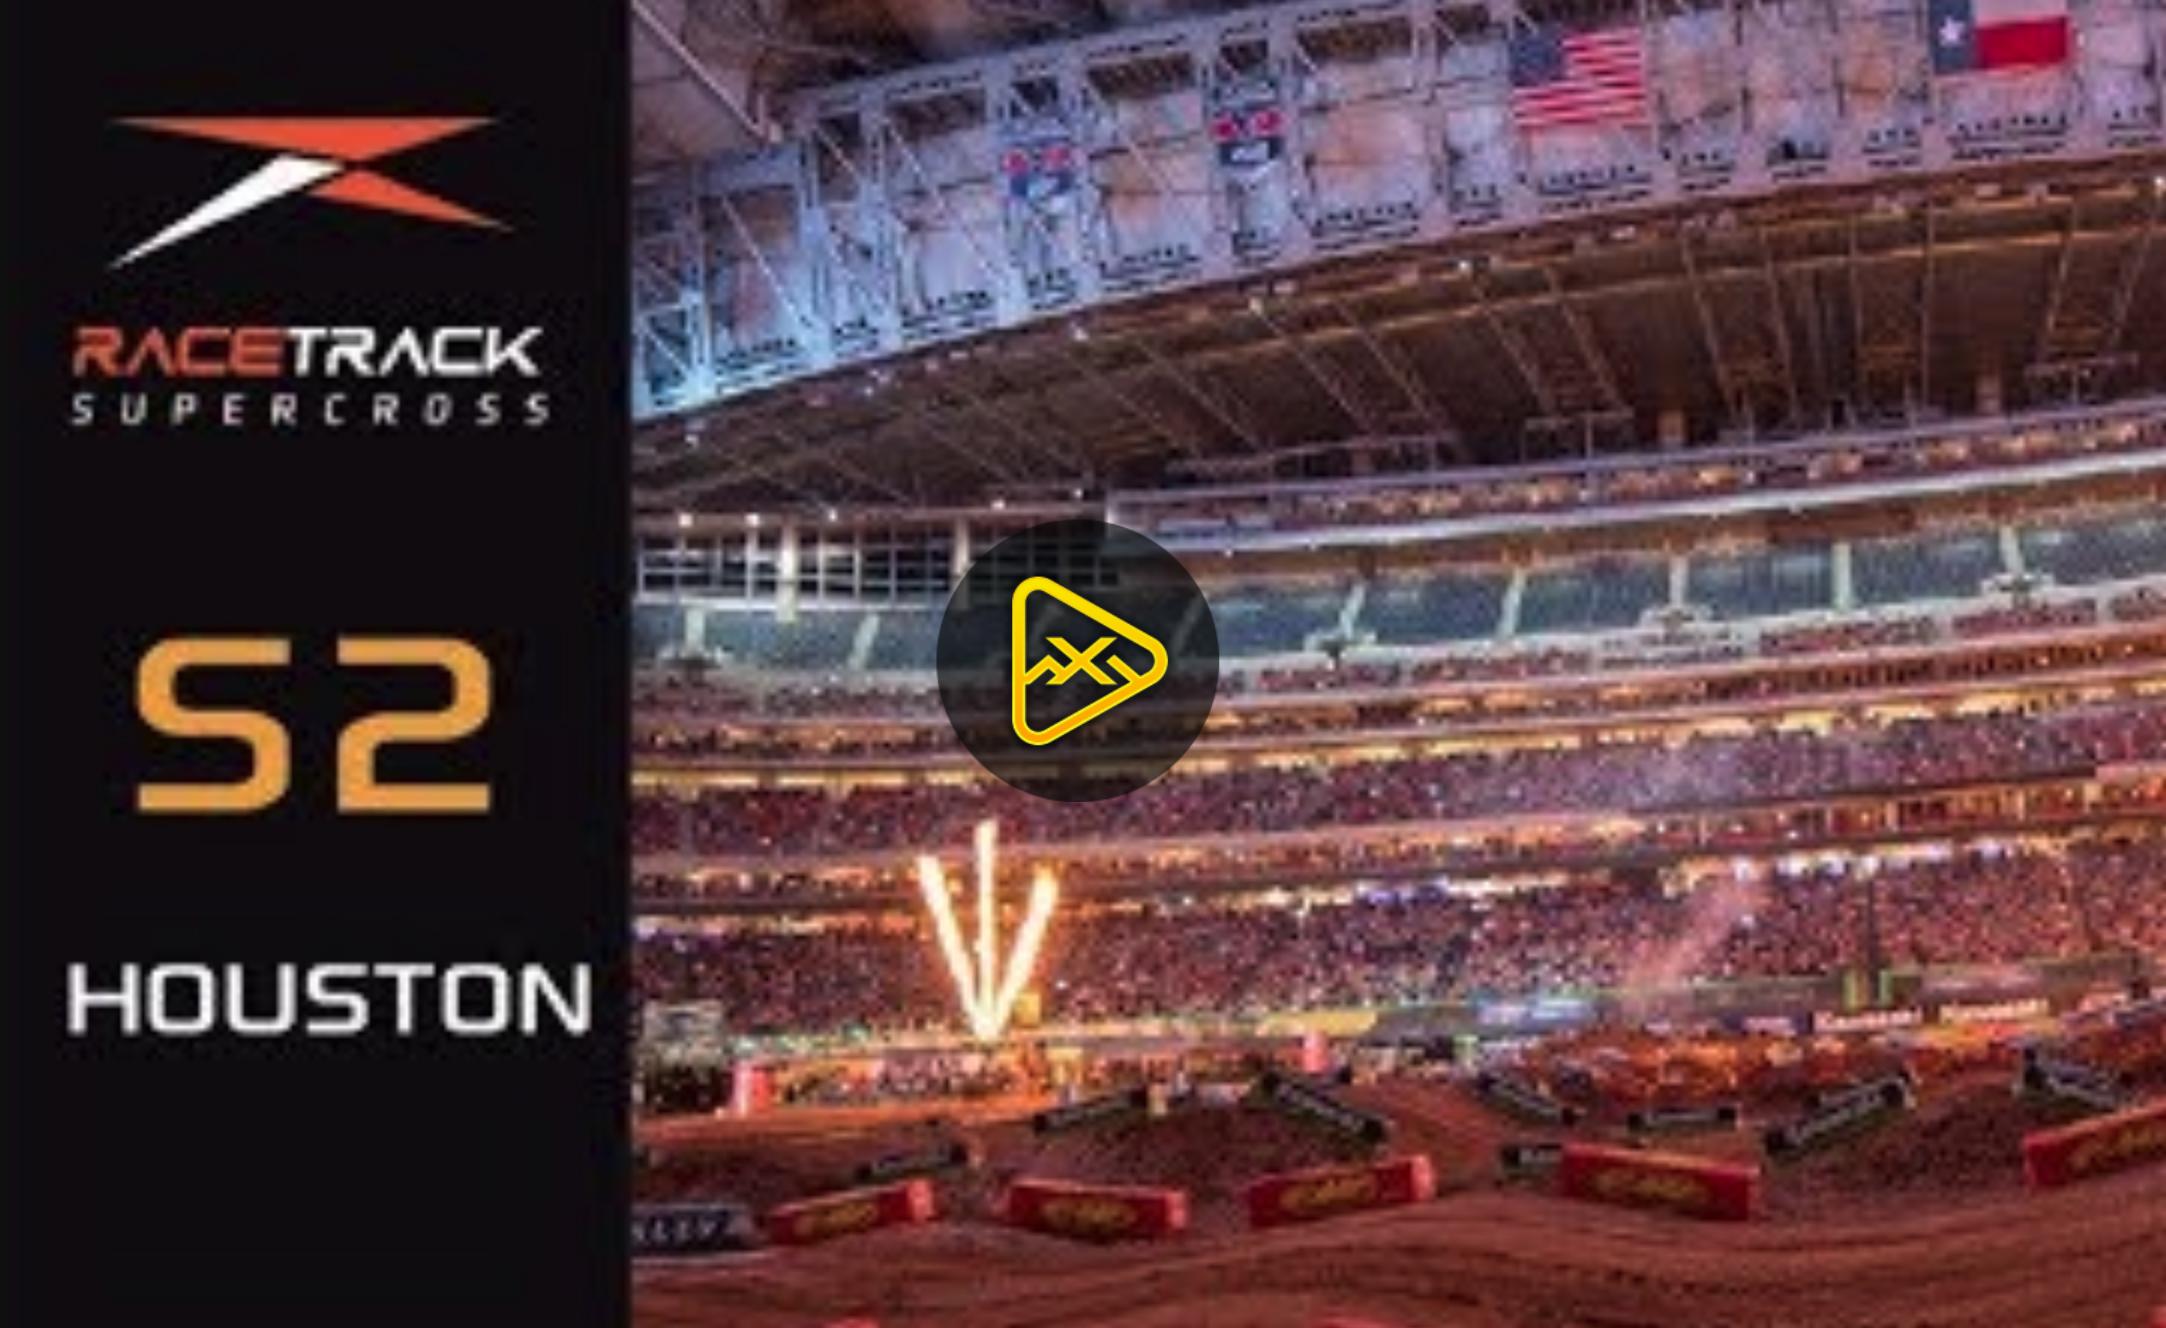 Racetrack Supercross – S2 – Houston SX